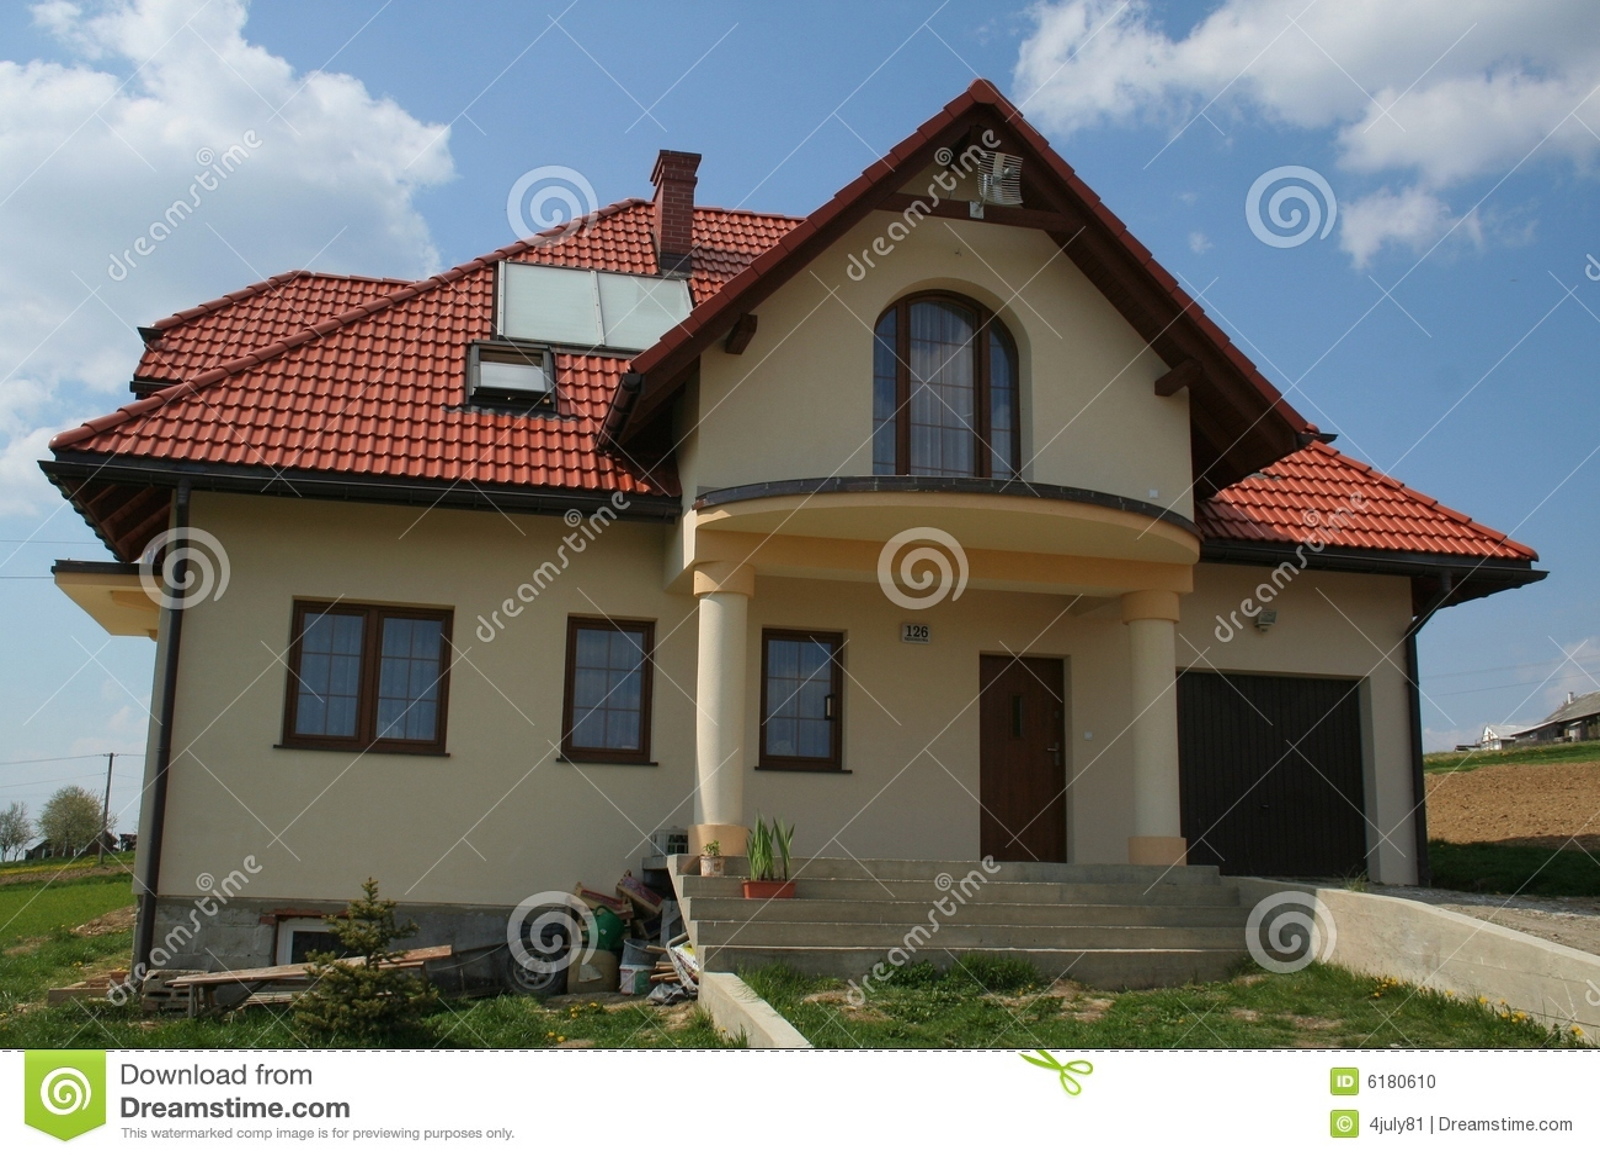 haus mit rotem dach stockfoto bild 6180610. Black Bedroom Furniture Sets. Home Design Ideas